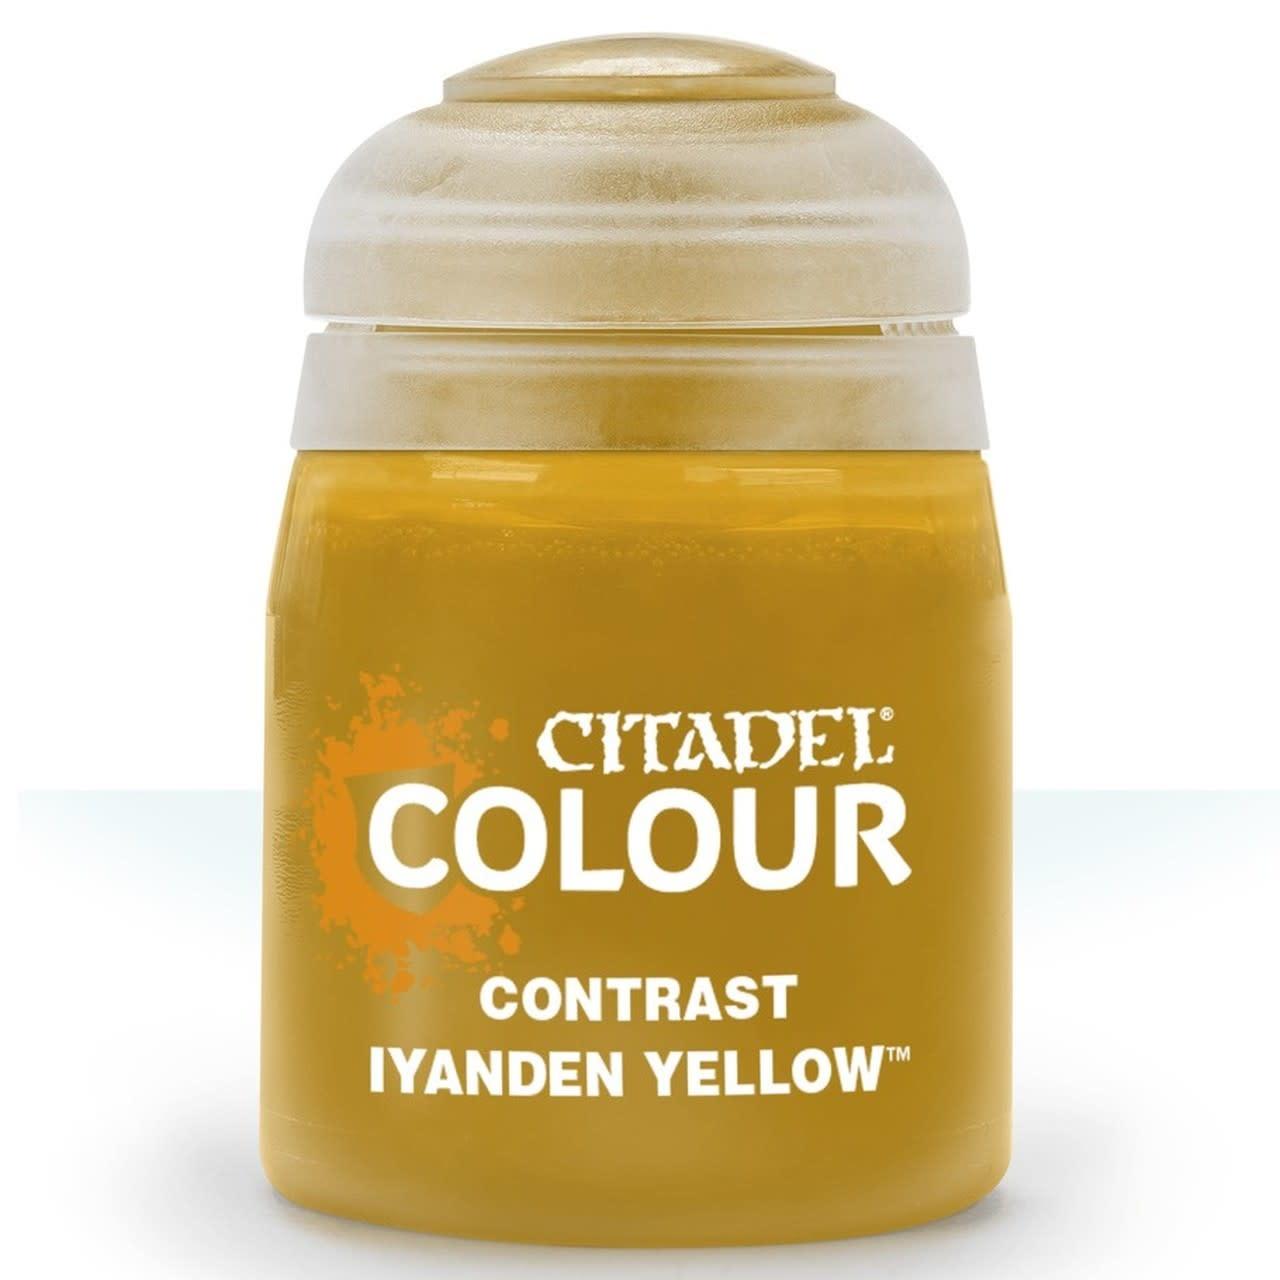 Citadel Paint Contrast: Iyanden Yellow